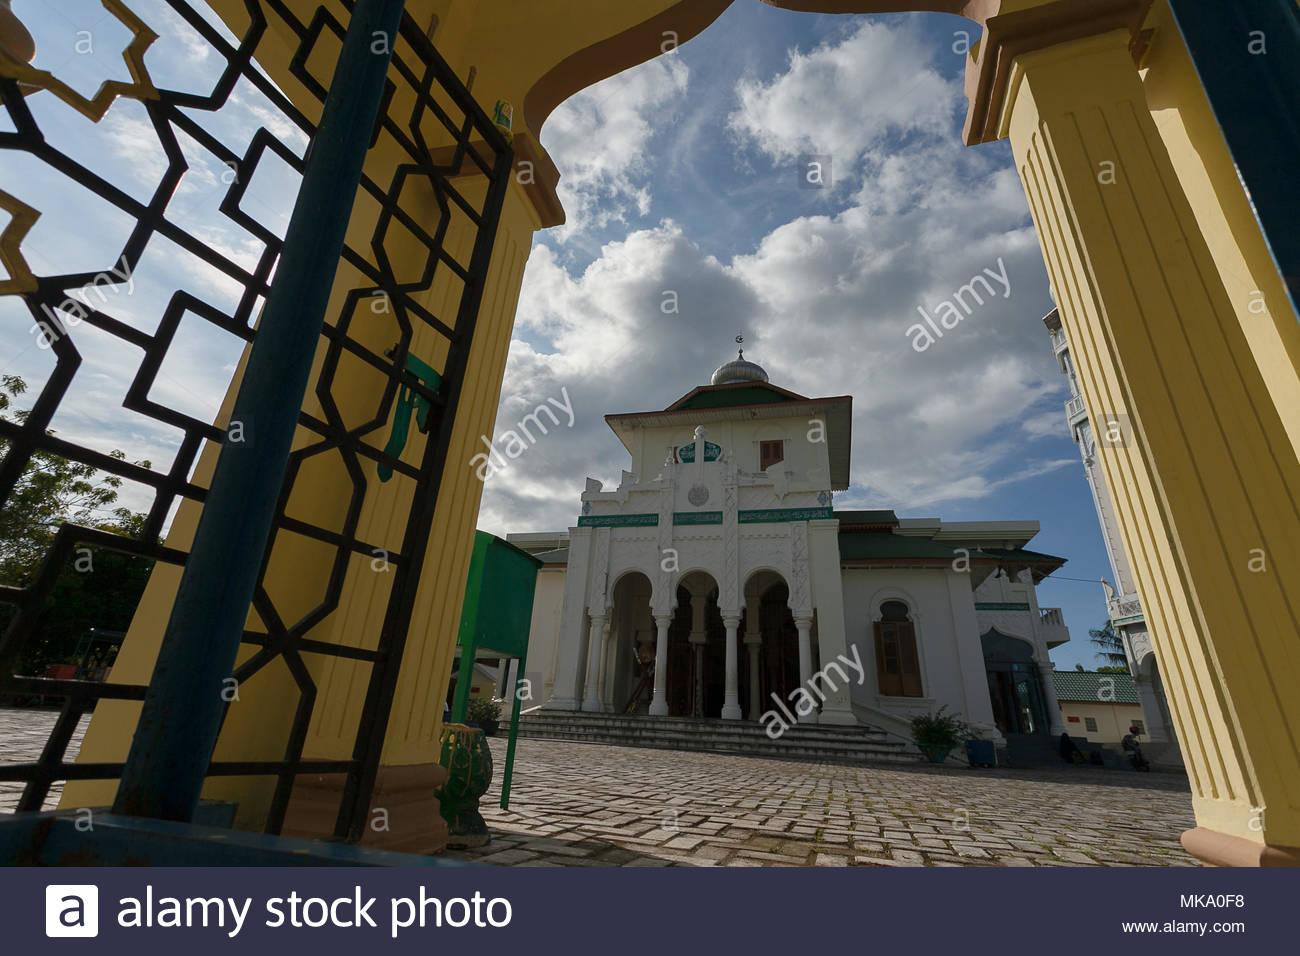 Aceh Besar Stock Photos Images Alamy Masjid Baiturrahim Ulee Lheue